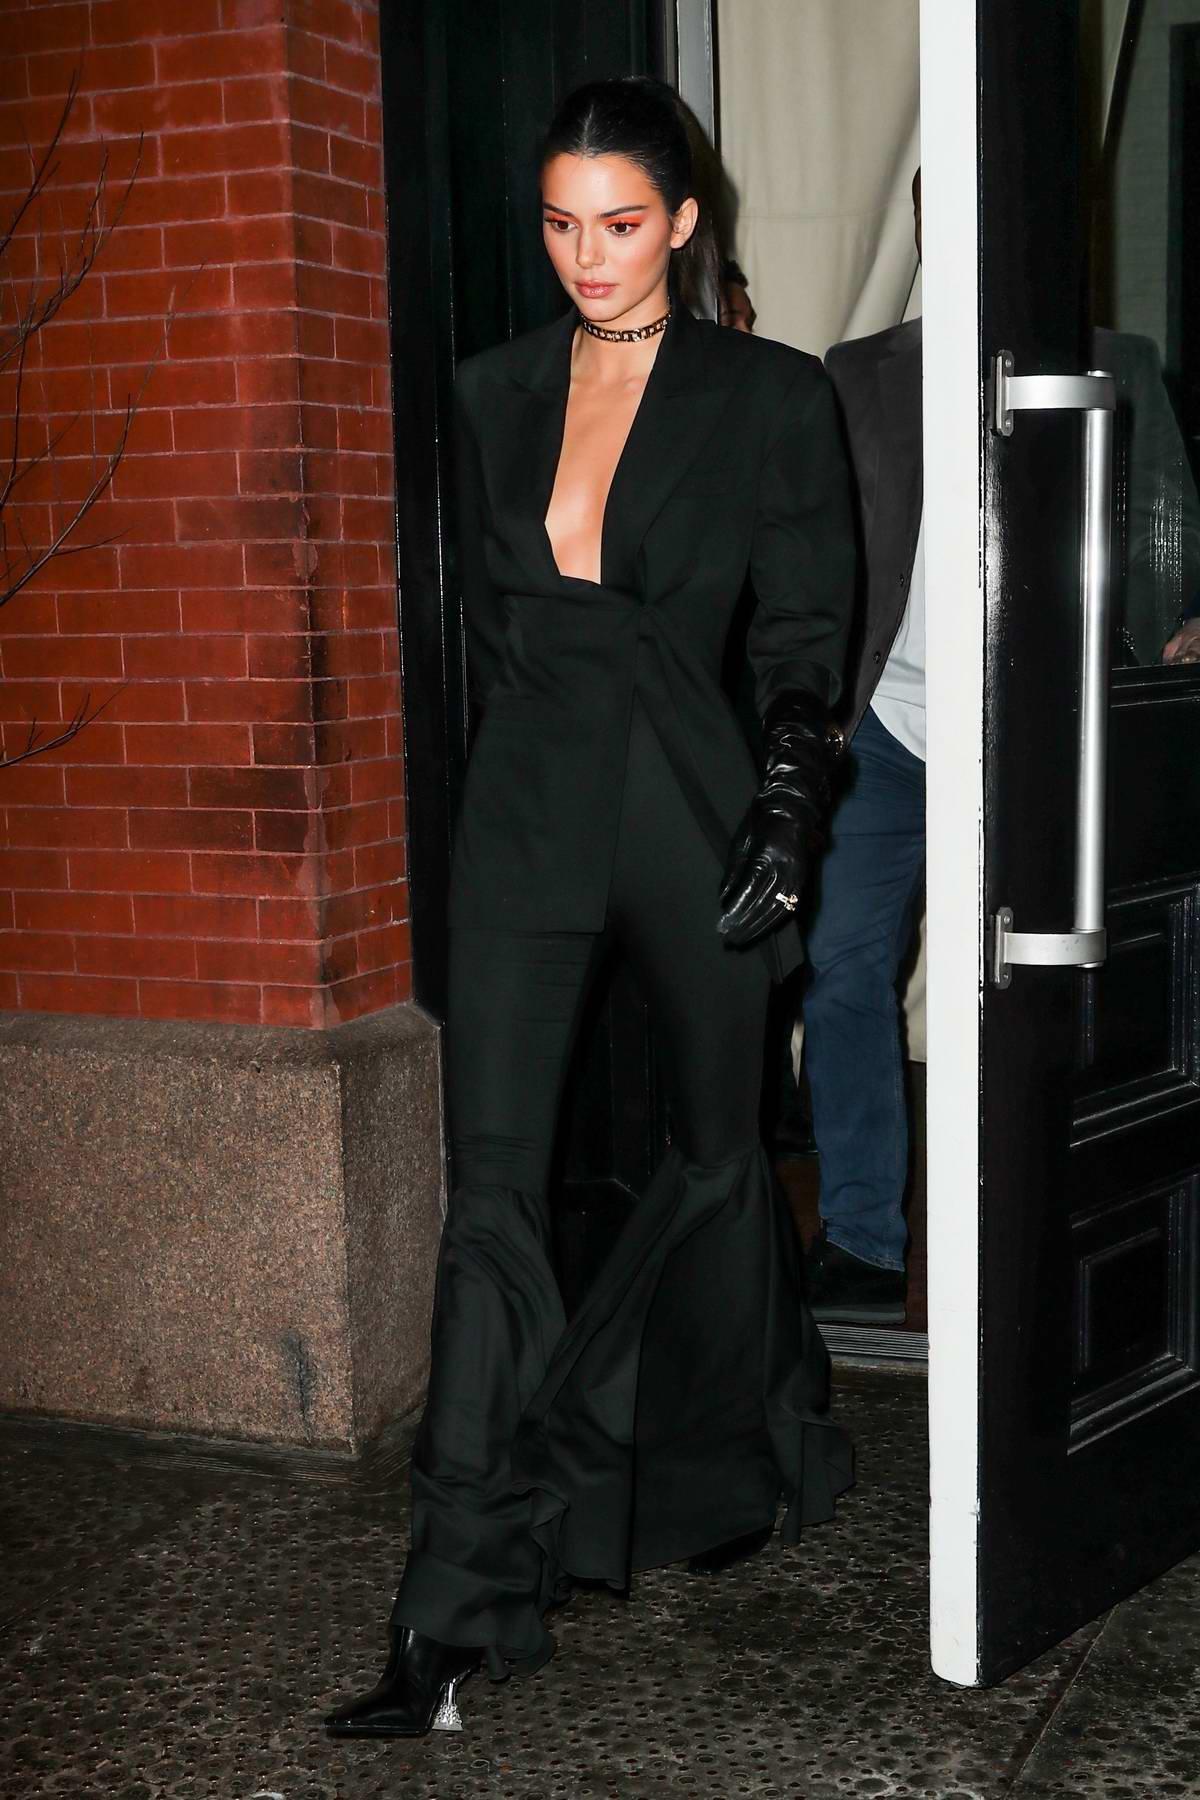 Kendall Jenner looks stunning in black suit as she leaves Mercer Hotel in New York City